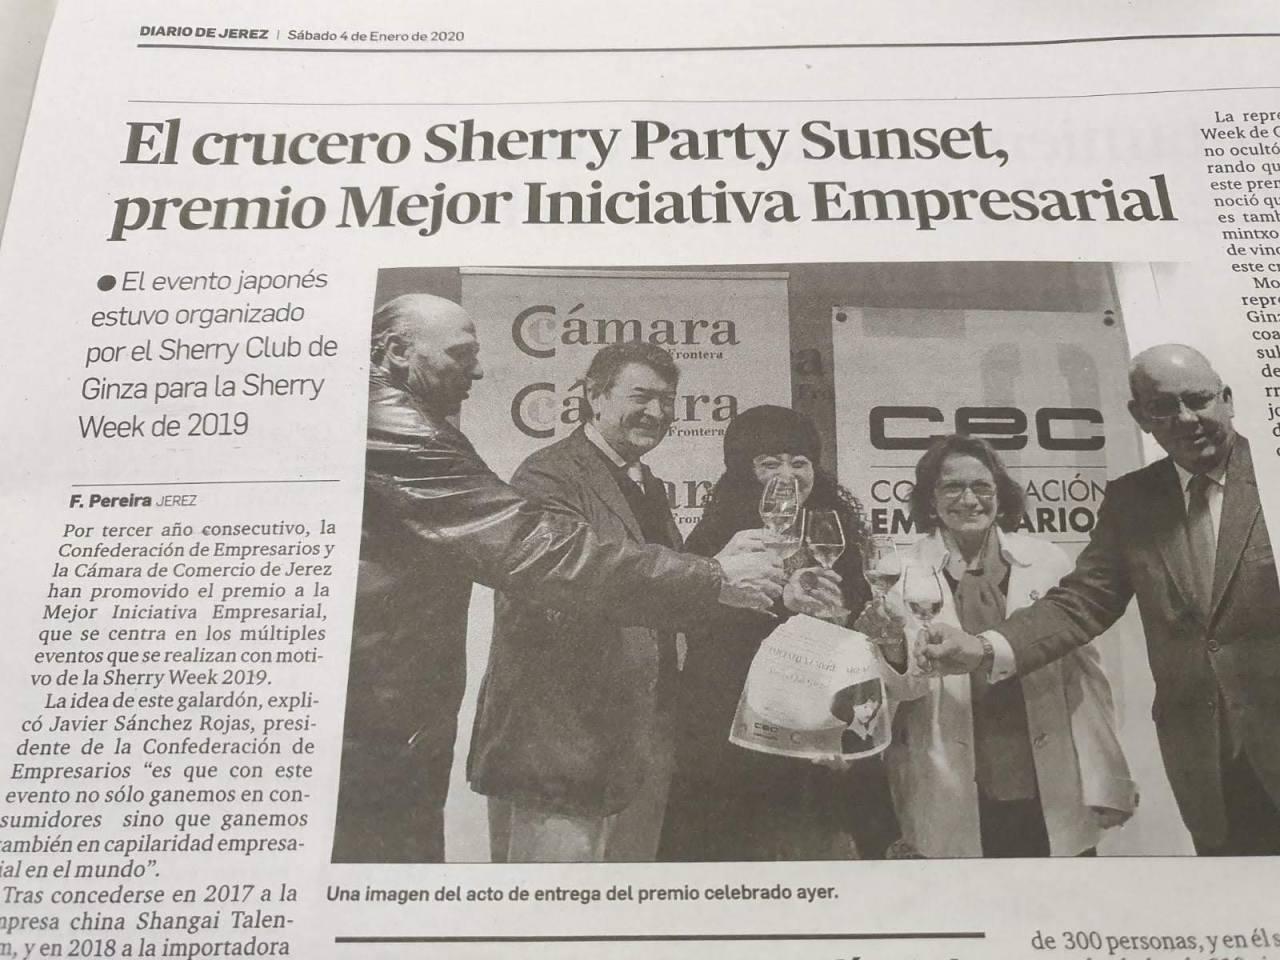 El crucero Sherry Party Sunset, premio Mejor Iniciativa Empresarial (Diario de Jerez.Spanish)